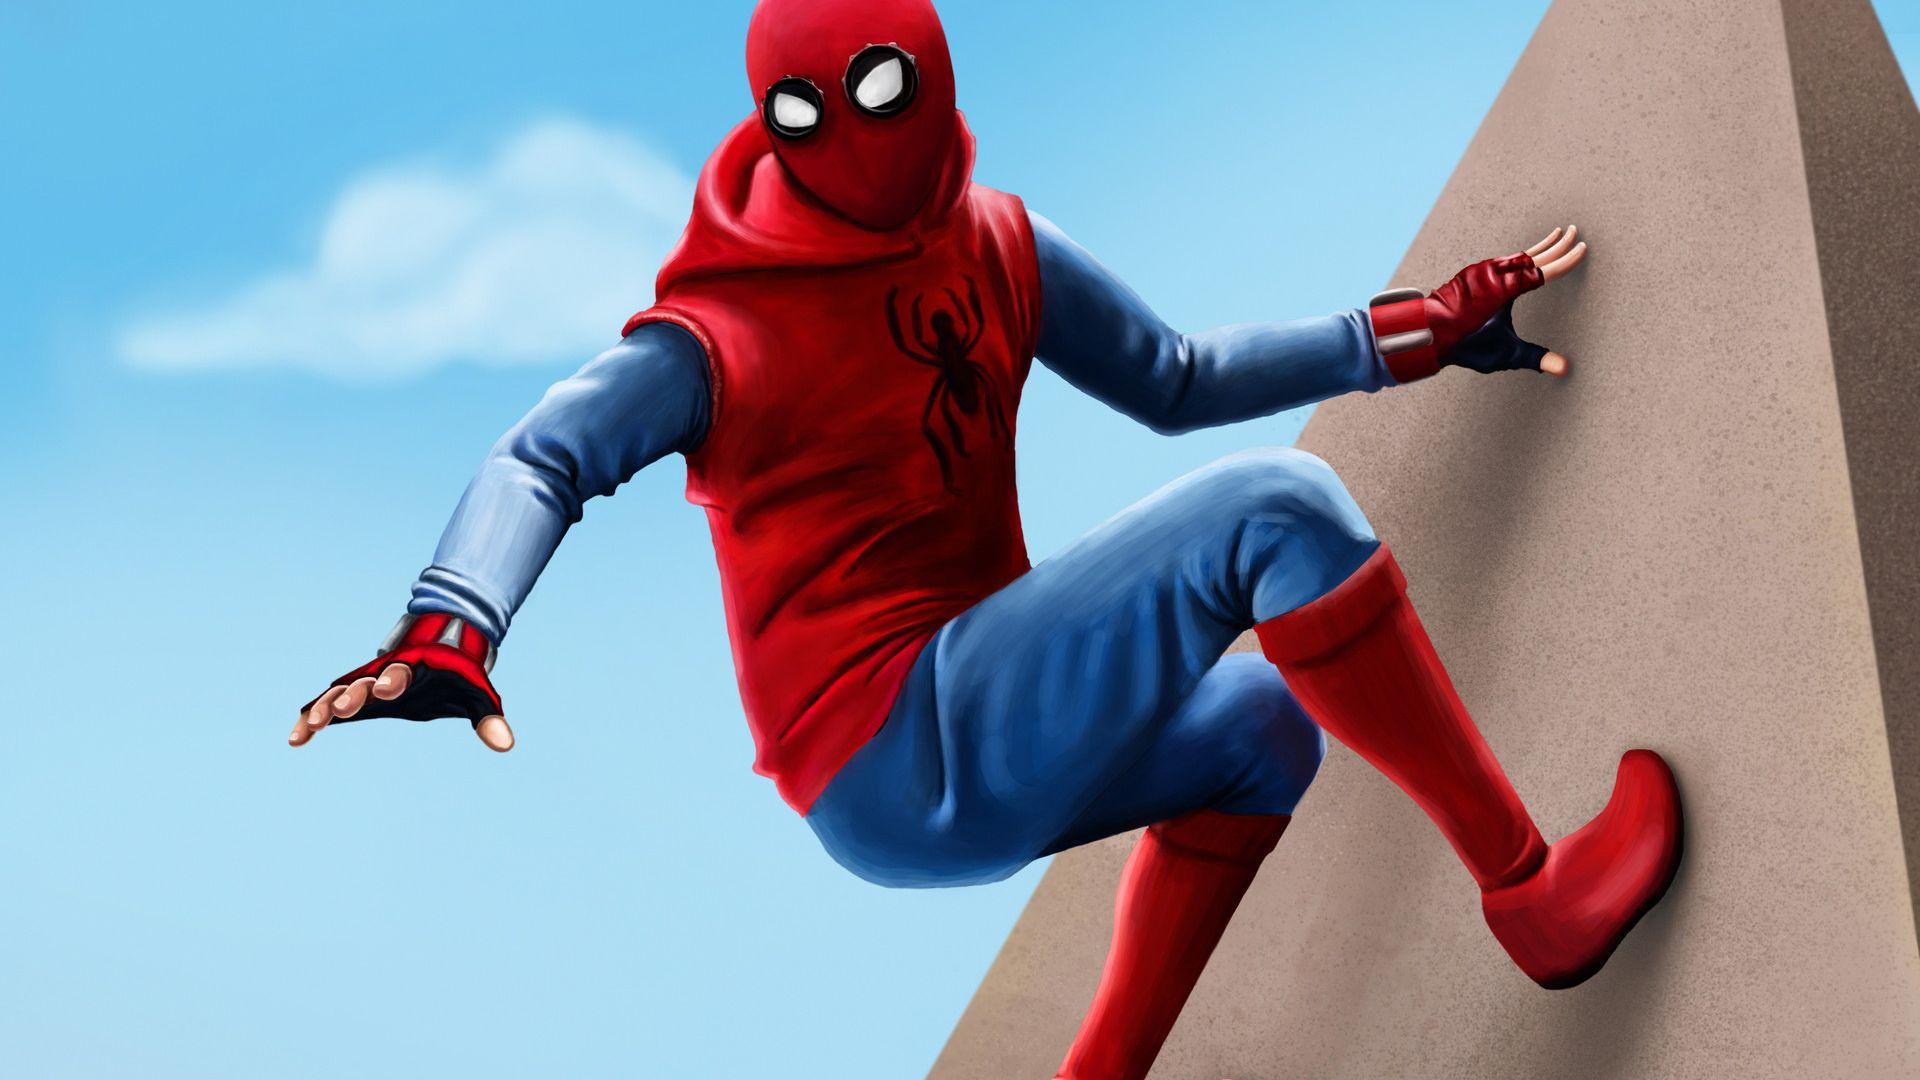 Wallpaper Spider Man: Homecoming, suit homemade, artwork